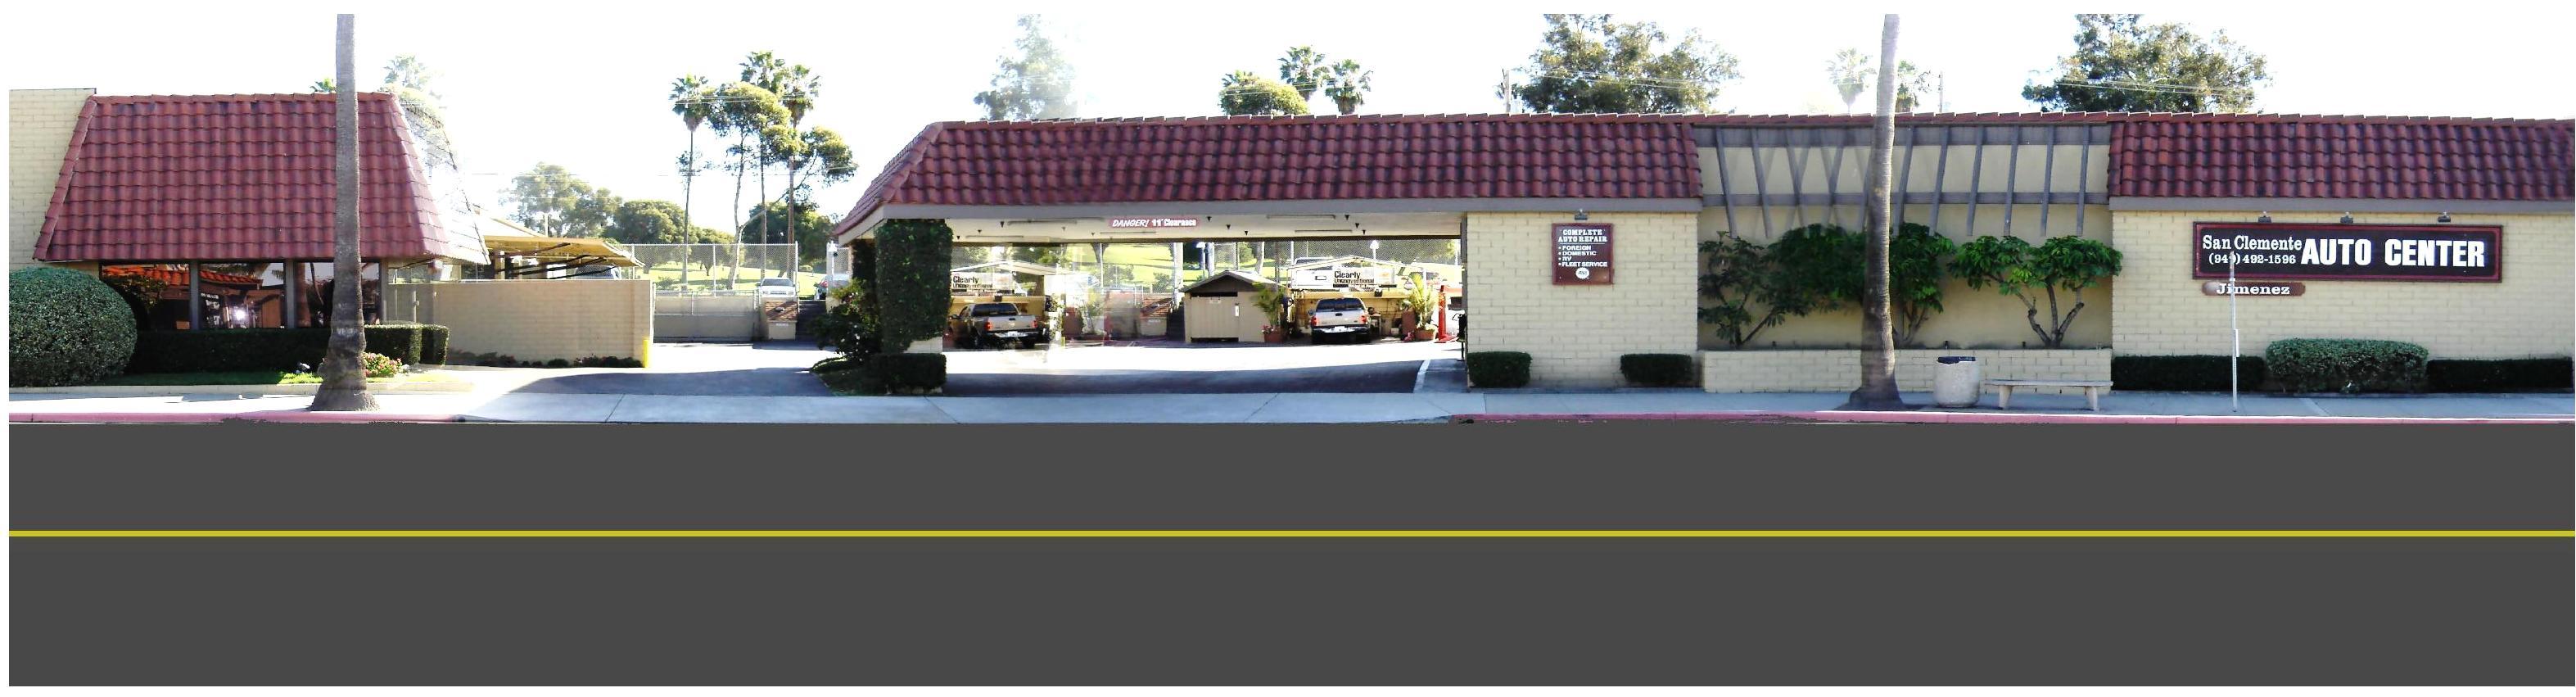 San Clemente Auto Center 2345 S. El Camino Real San Clemente CA 92672 (949) 492-1596